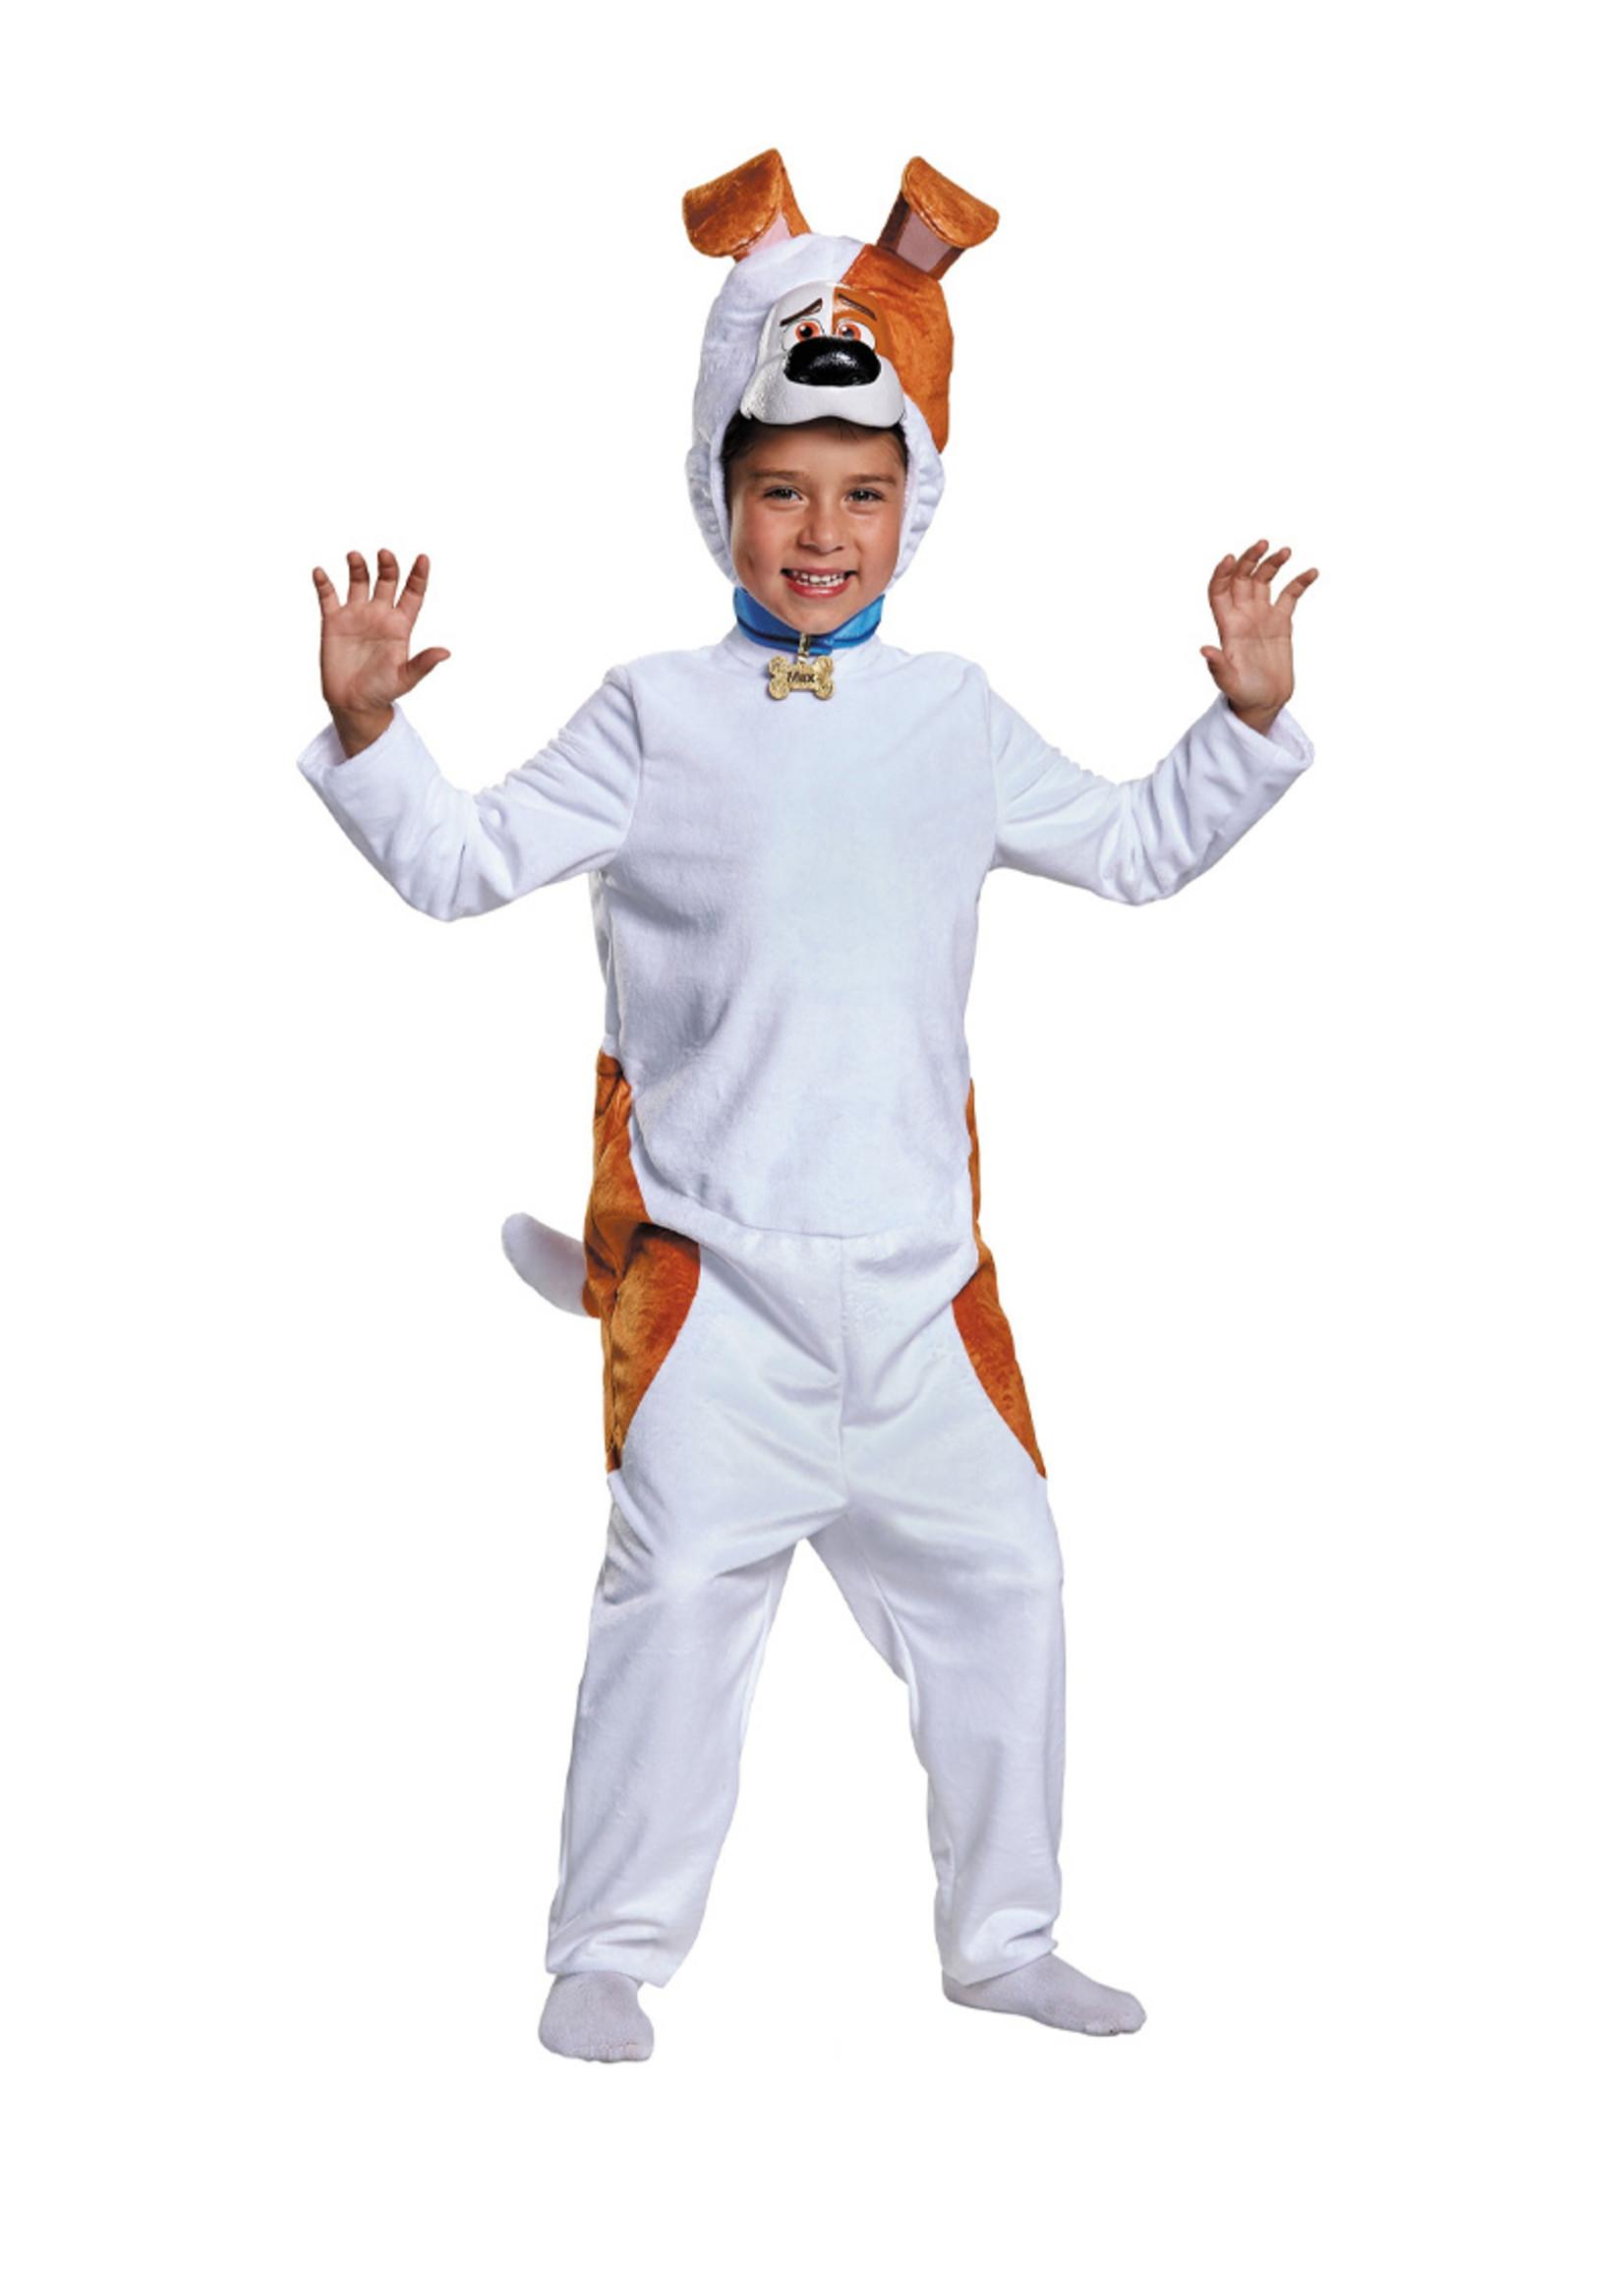 Max - The Secret Life of Pets Costume - Boys